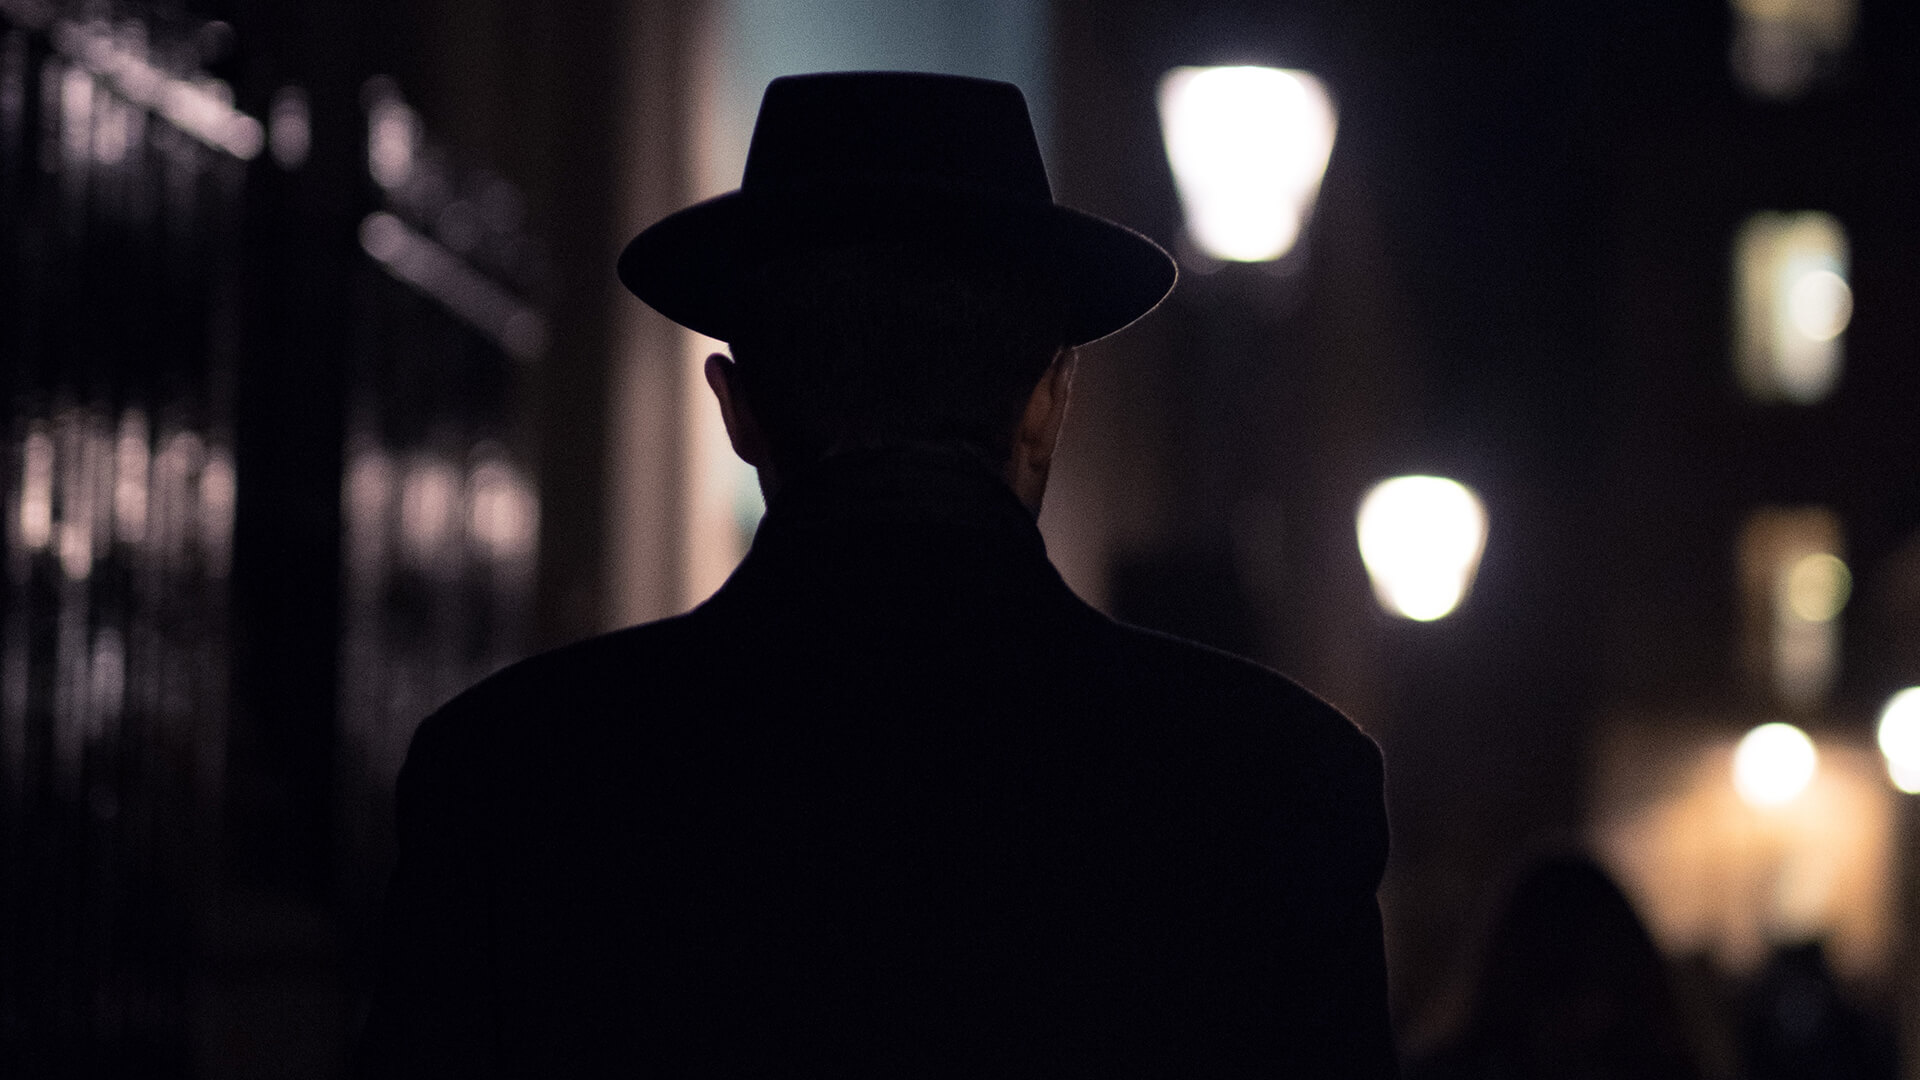 картинки американский шпион никому нет меня